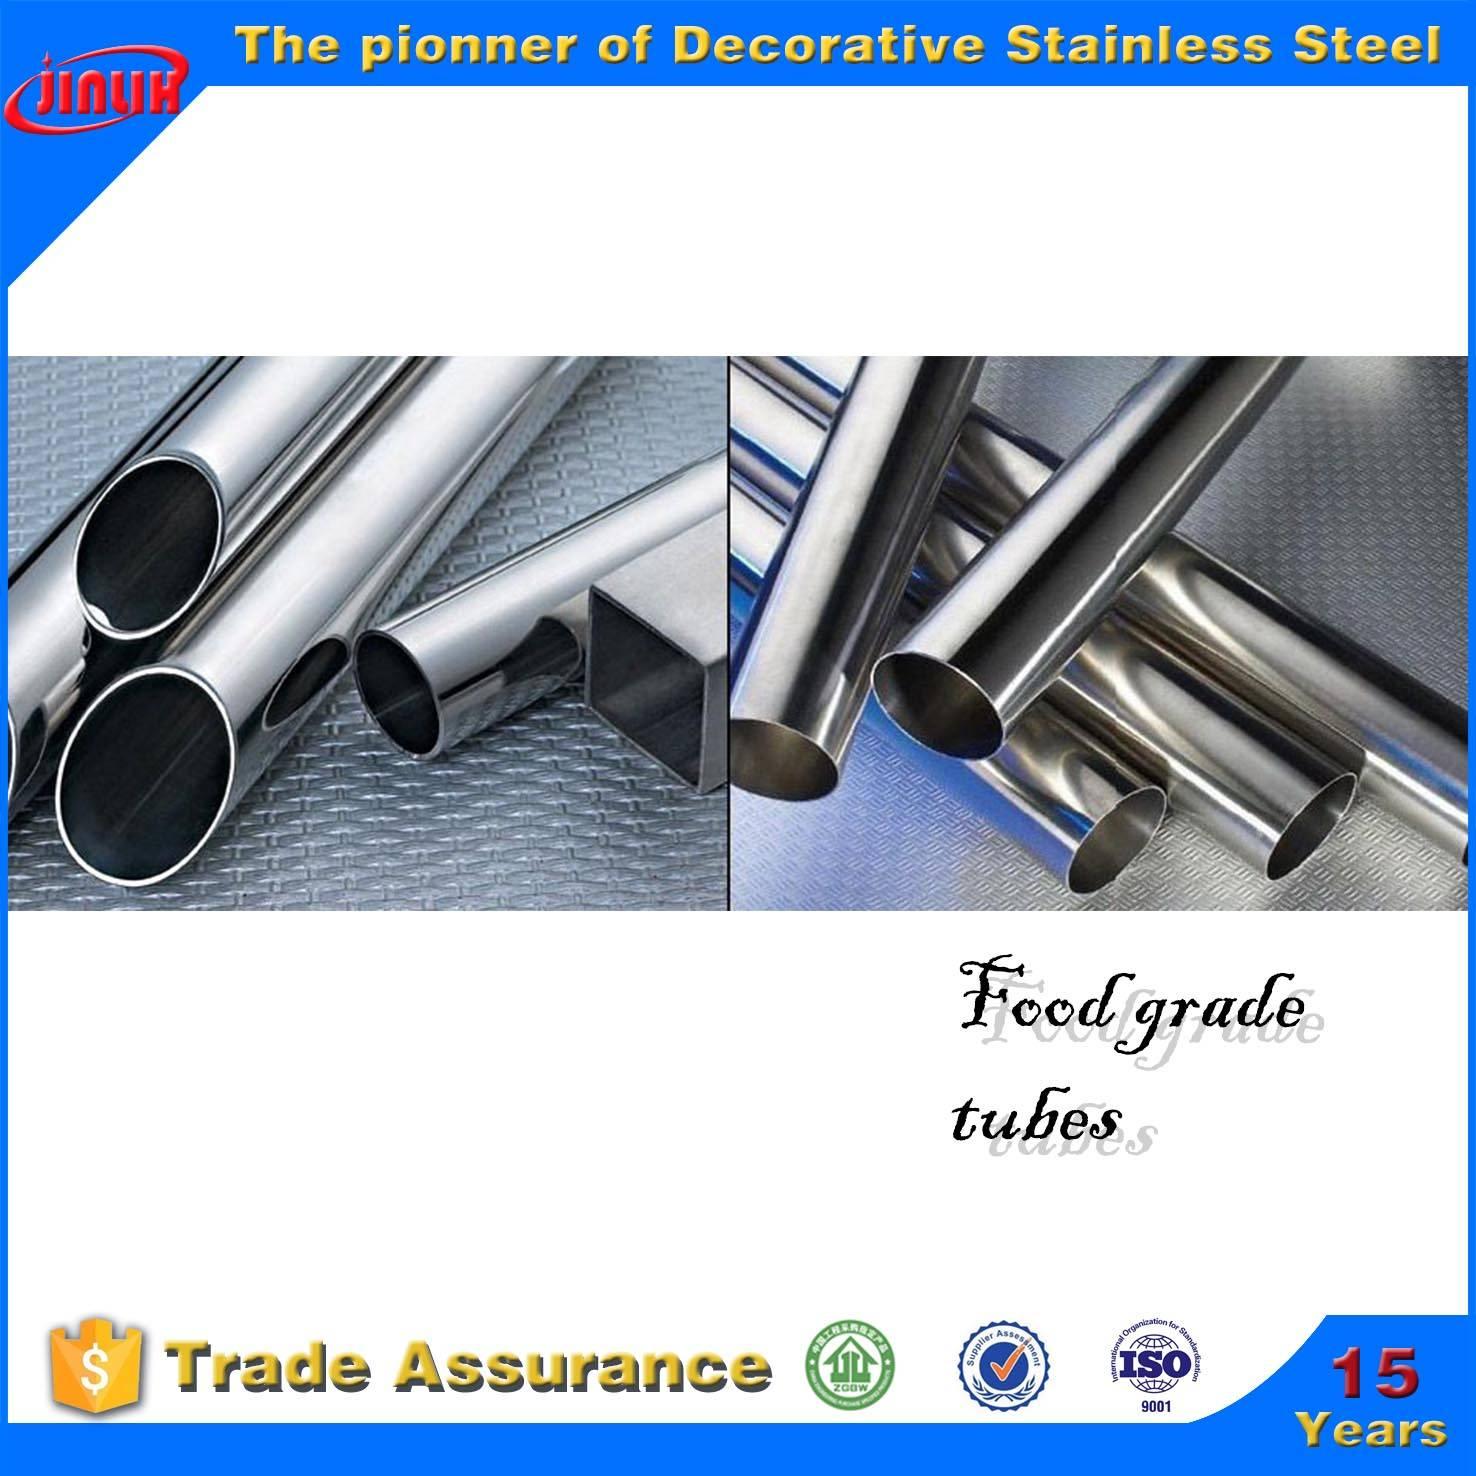 300 series stainless steel food grade tube for liquid transportation